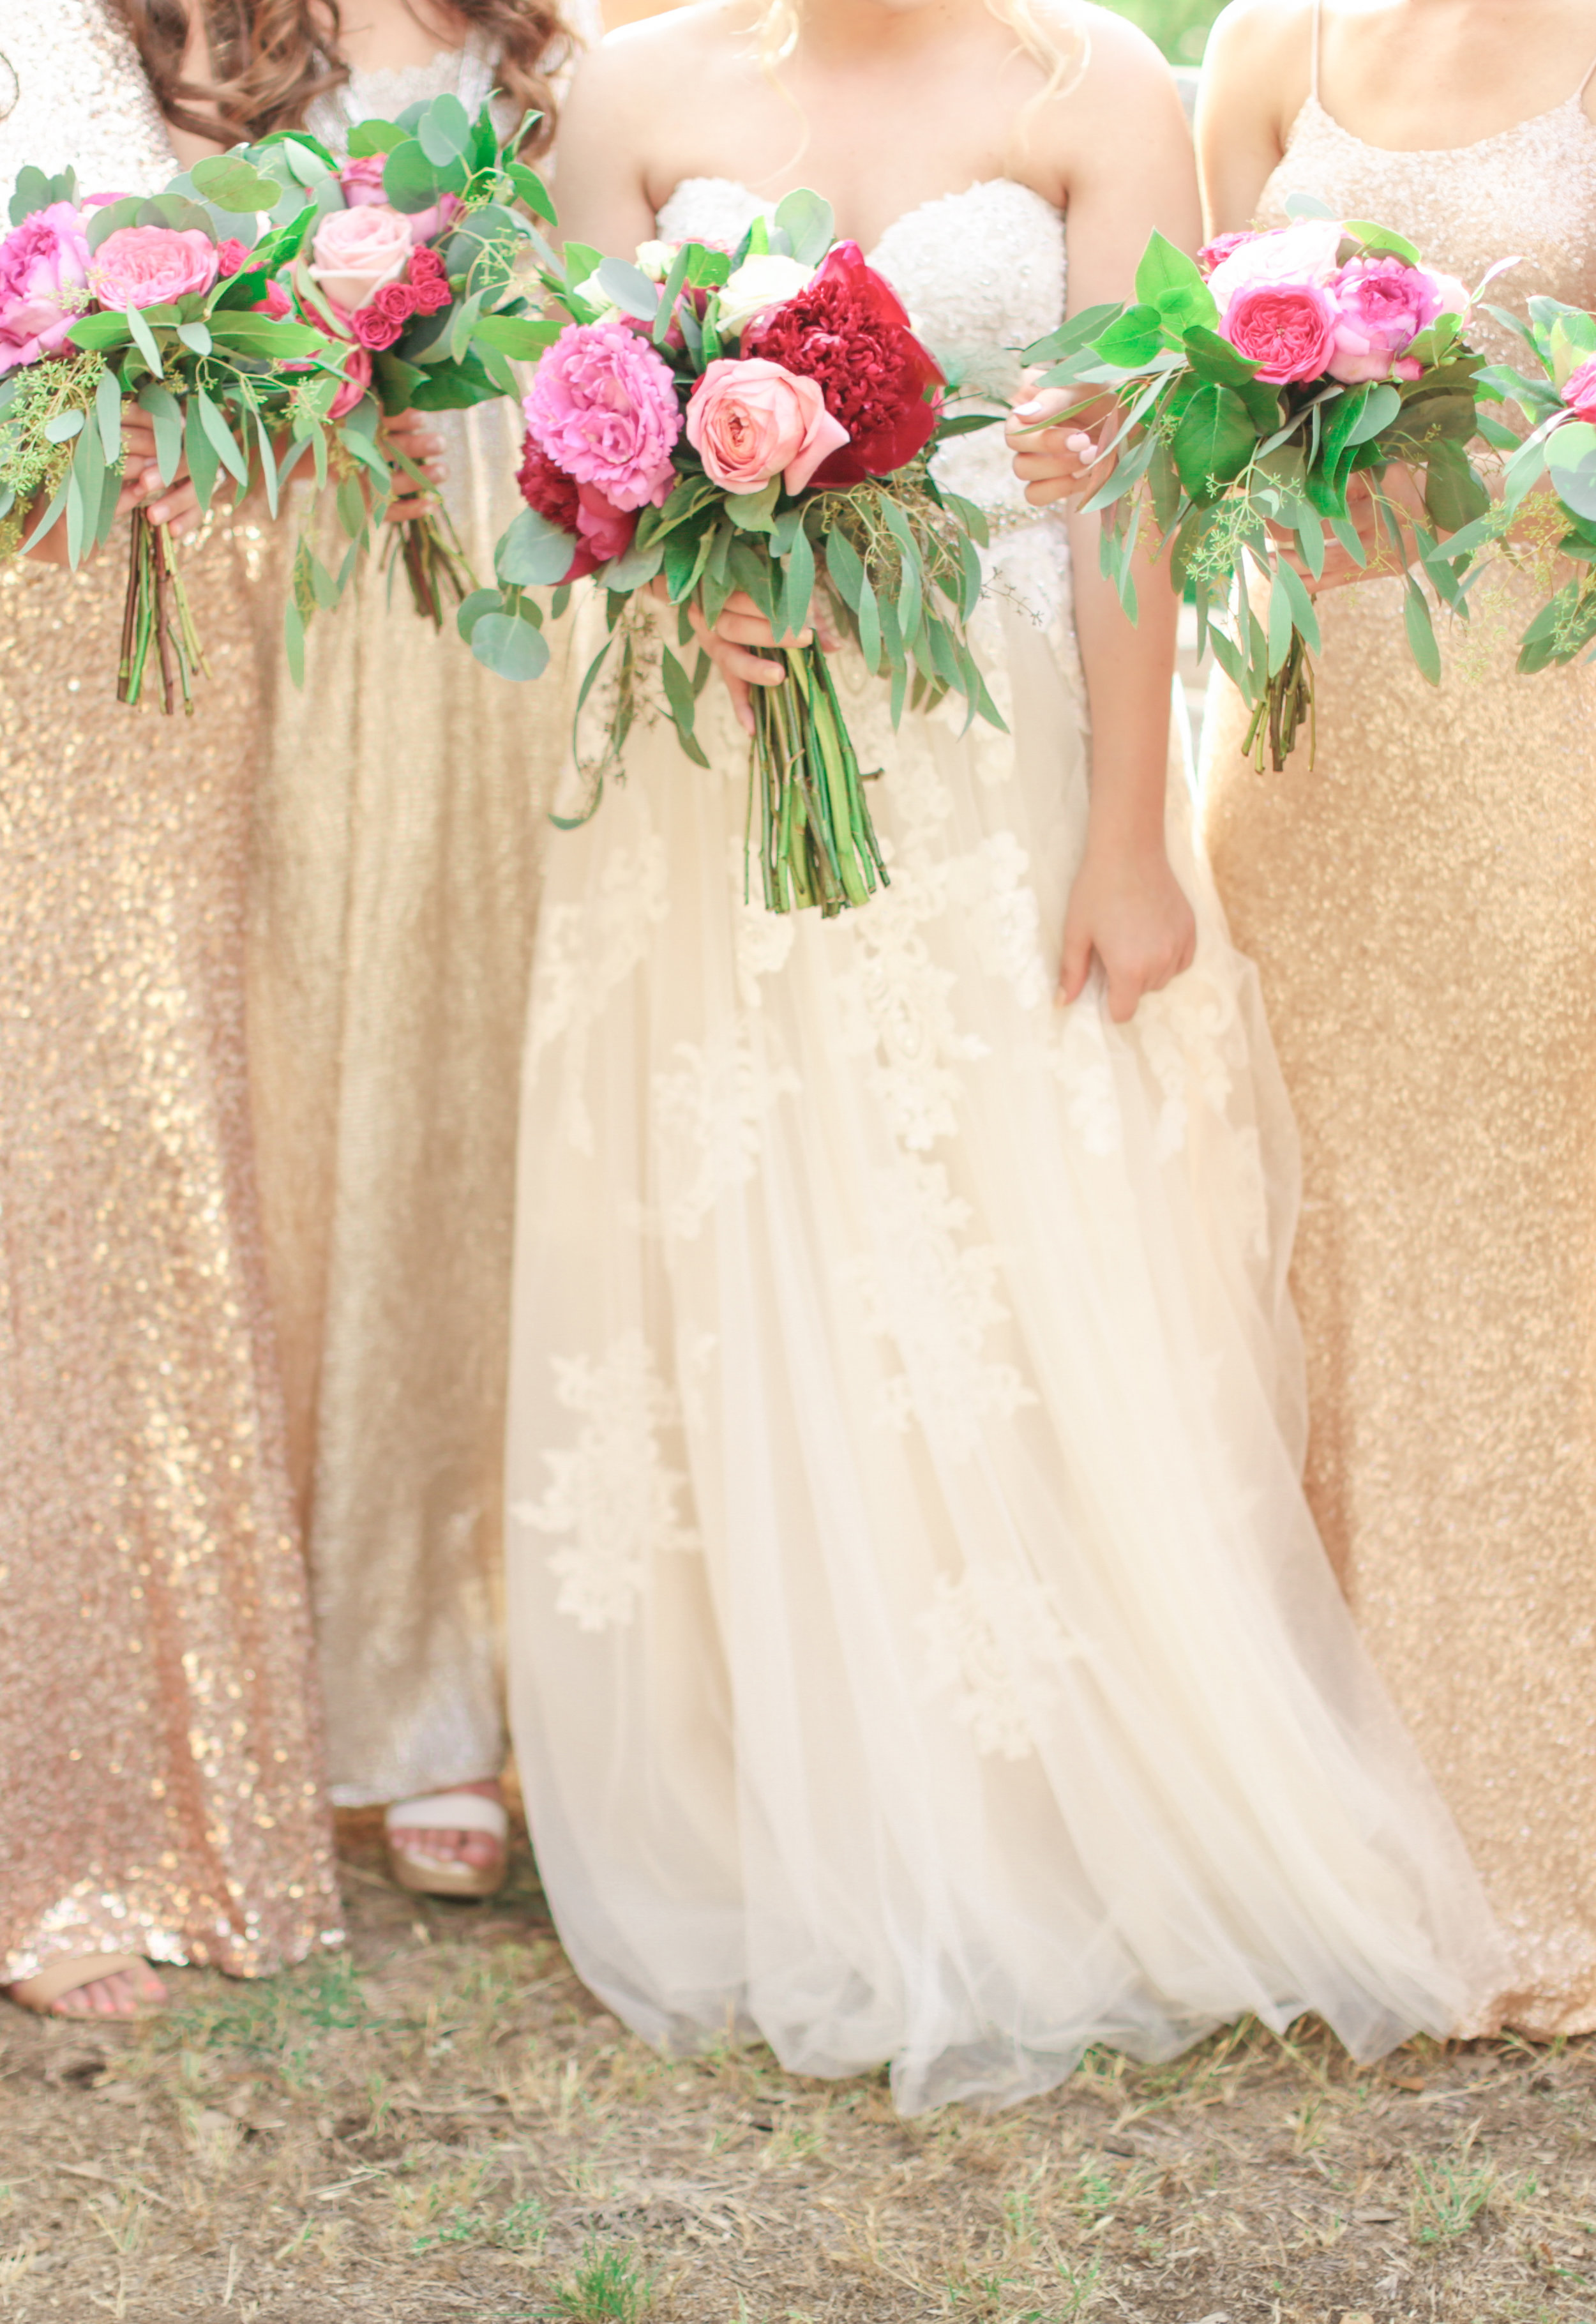 Lewis Wedding Collection - Shara Jo Photography-511.jpg